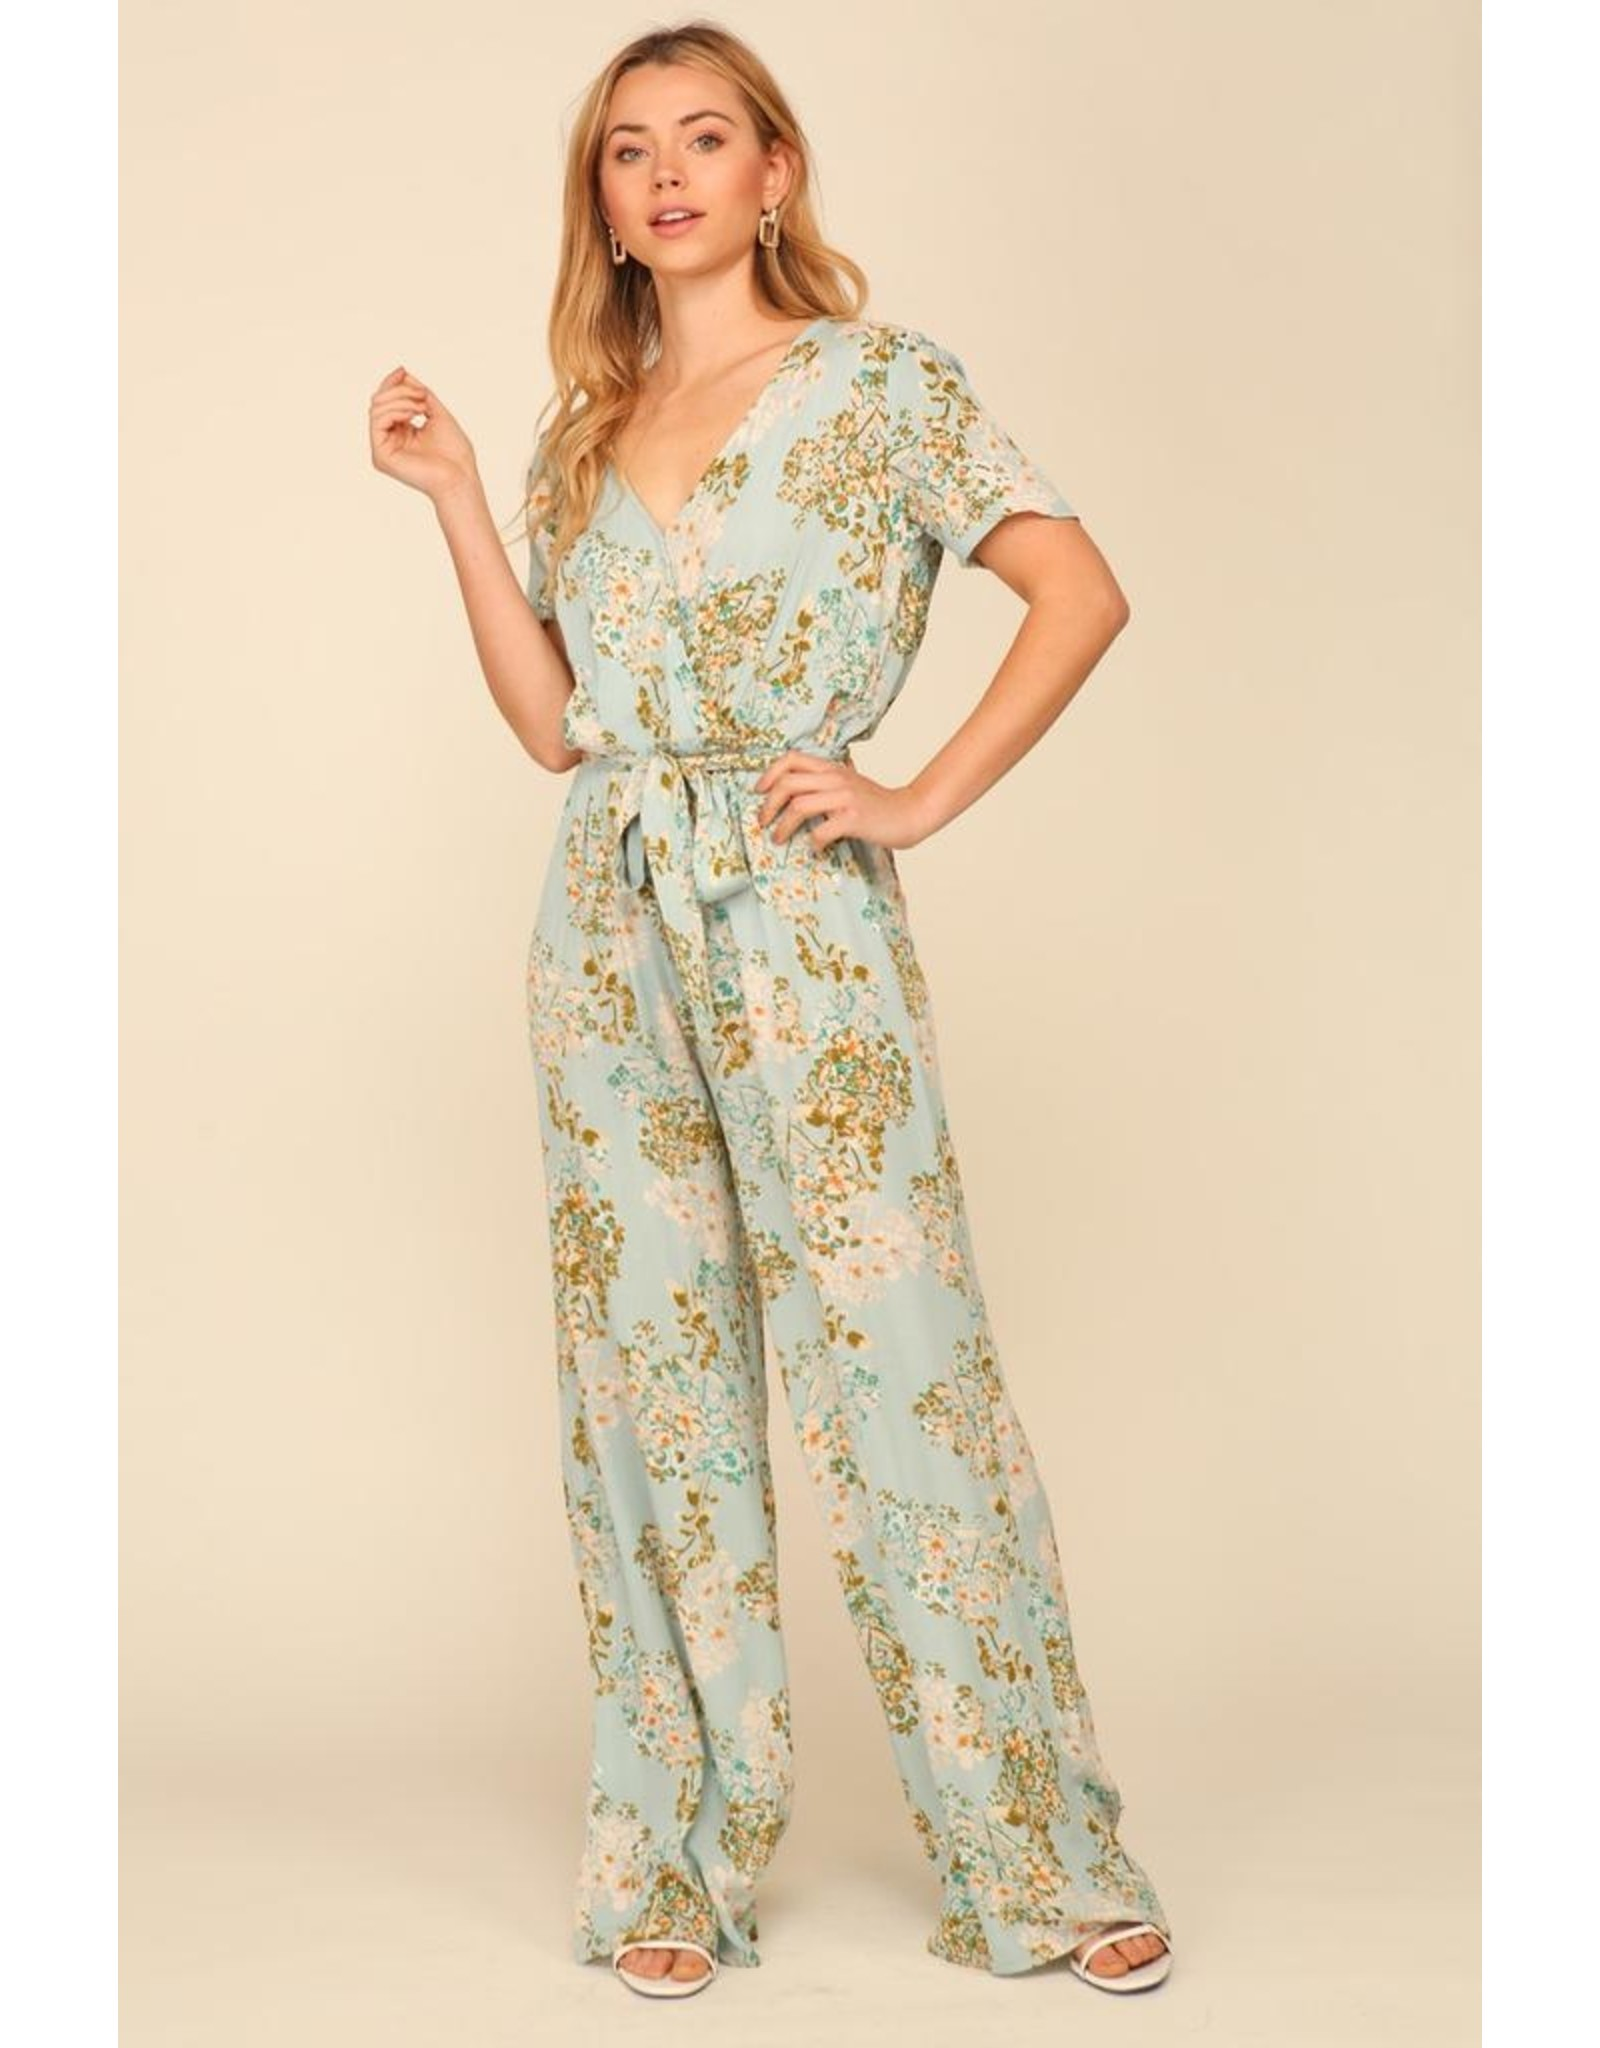 Short Sleeve Wrap Style Floral Jumpsuit